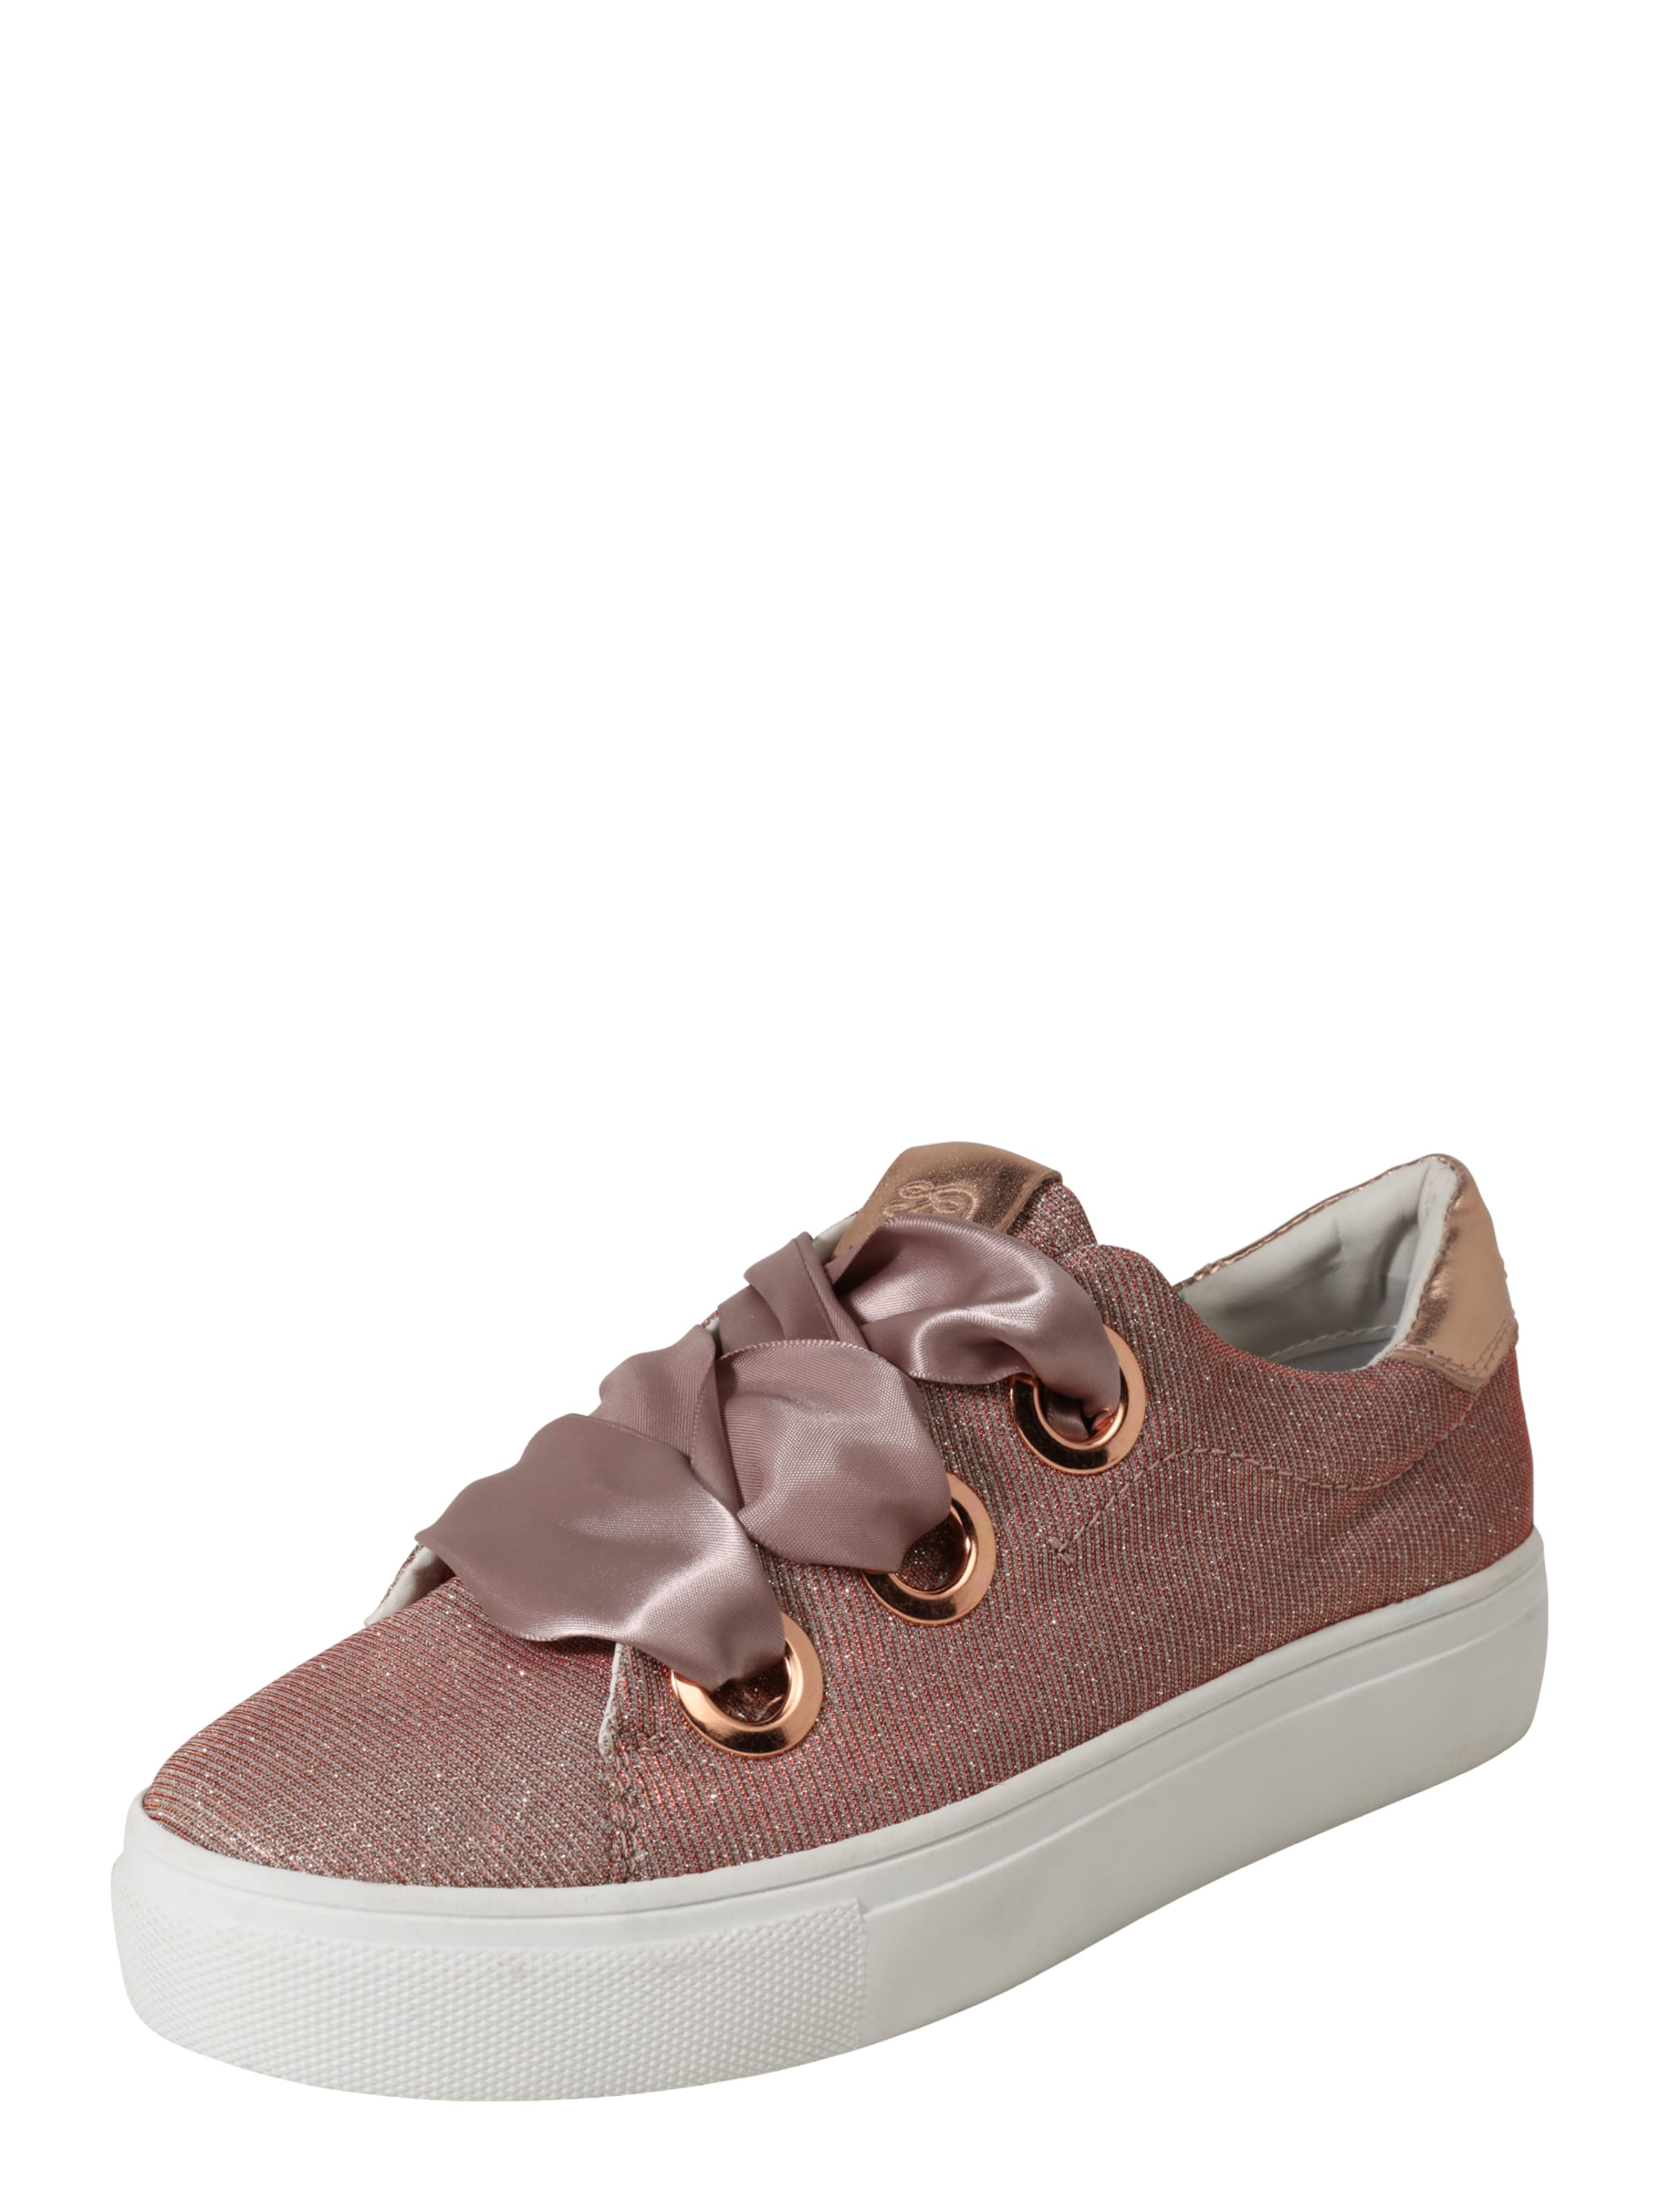 TOM TAILOR Sneaker mit Glitzereffekt rosa 1Va2Yg